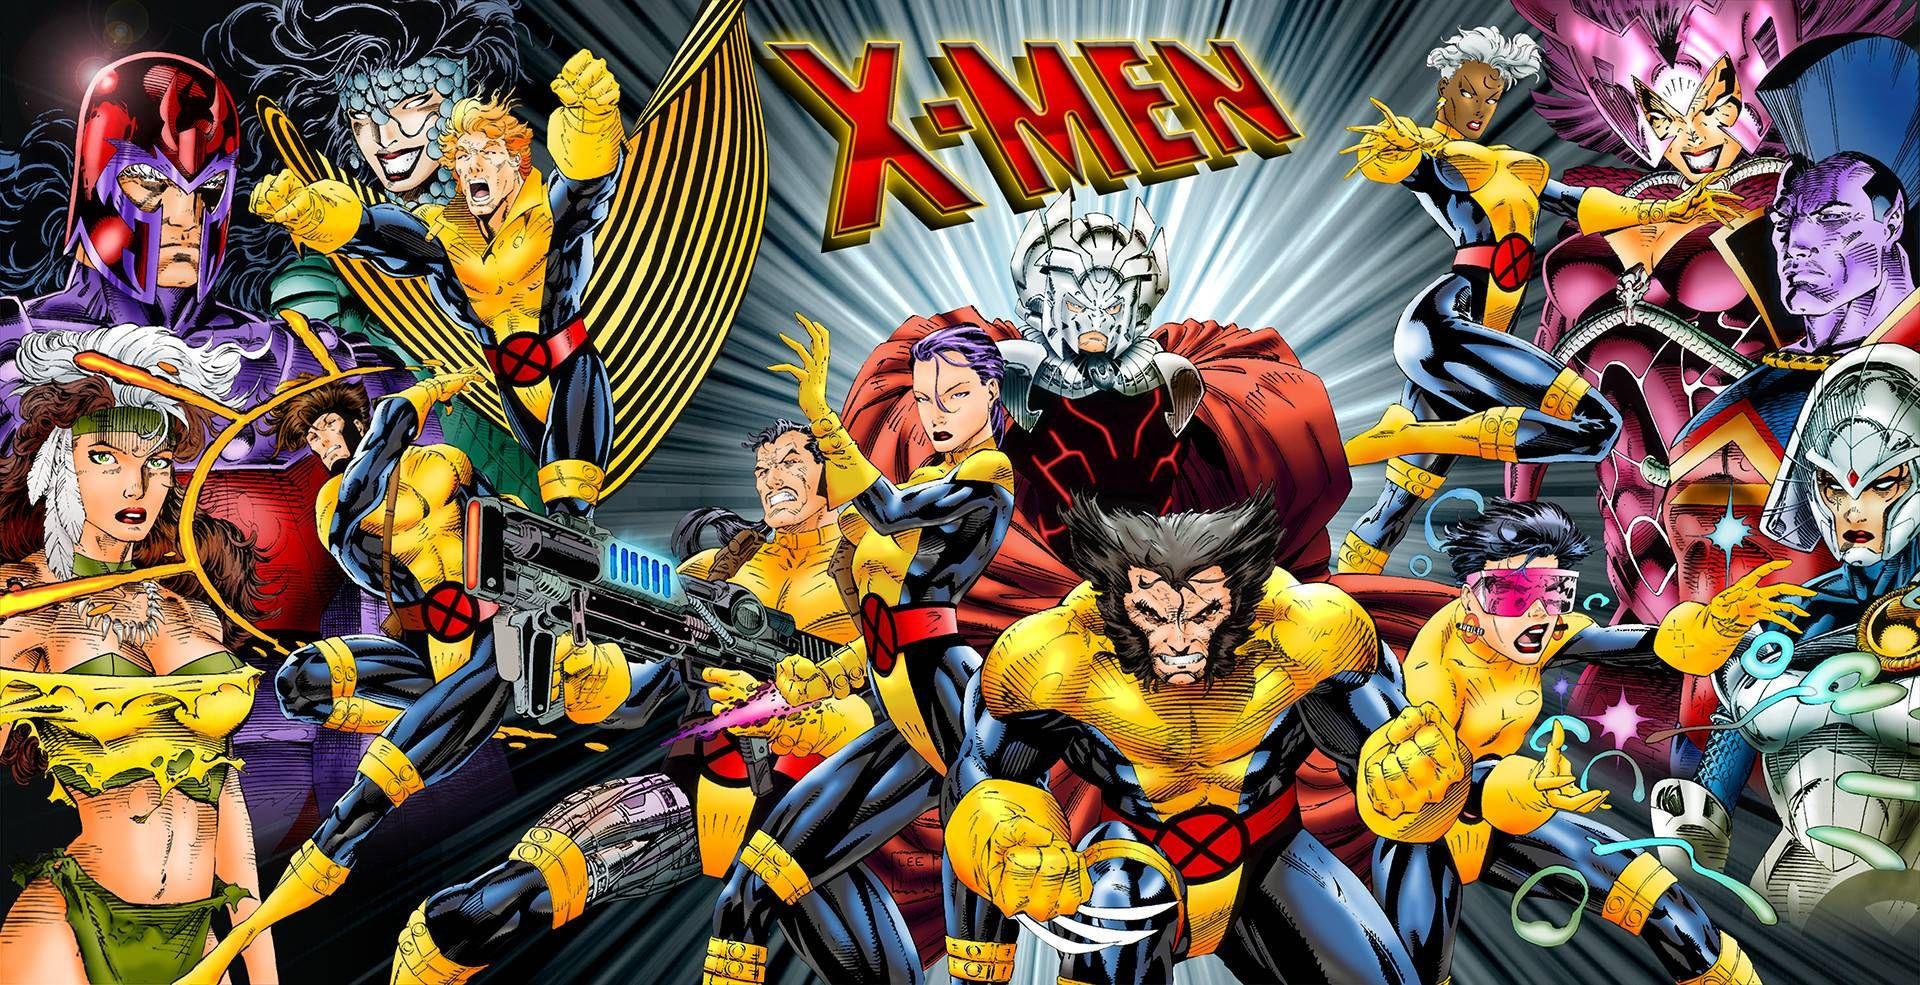 Undefined X Men Wallpapers 52 Wallpapers Adorable Wallpapers Jim Lee Art Comic Art Comics